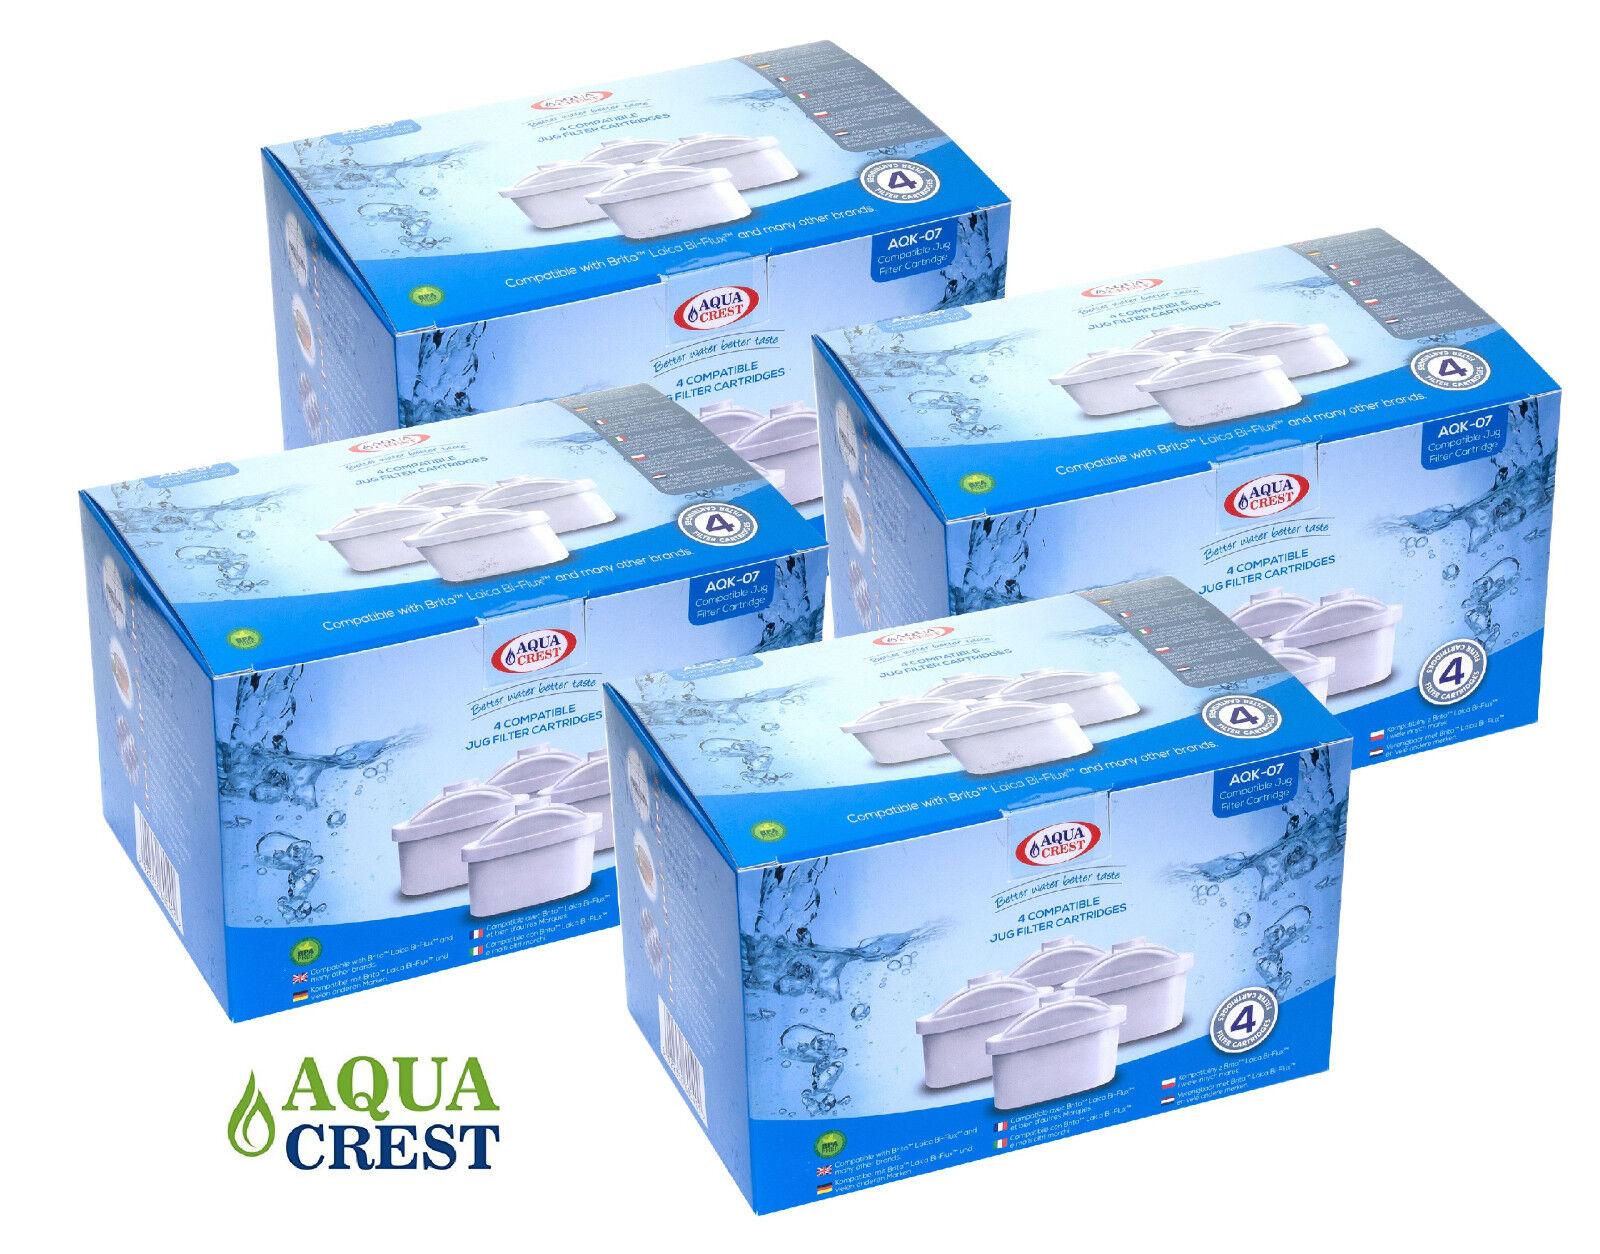 16 x aquacrest aqk-07 per Bosch Tassimo sostituire BRITA MAXTRA Filtro acqua